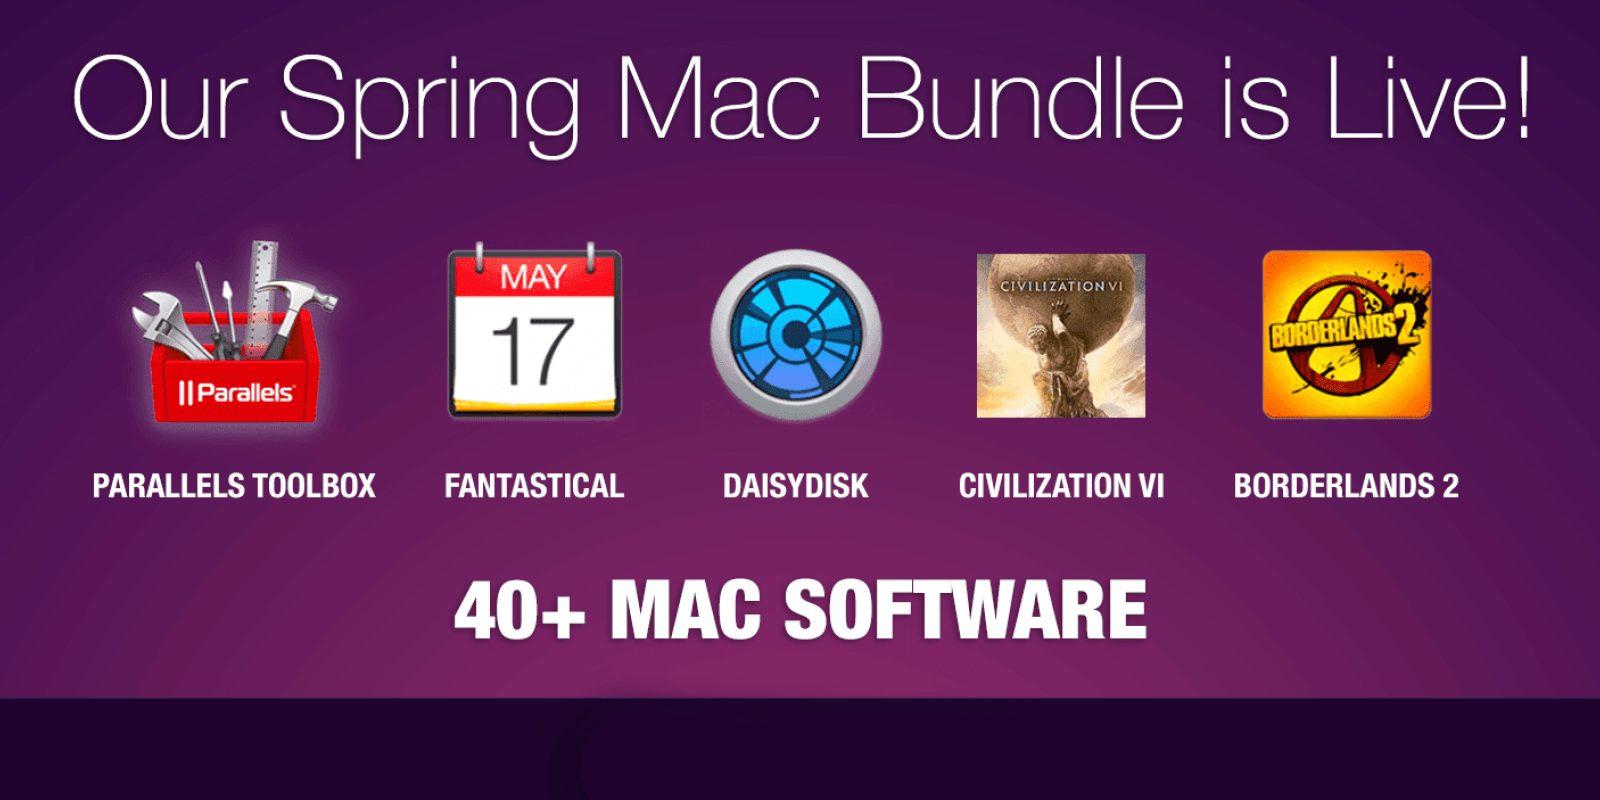 Latest BundleHunt Mac App bundle starts at $5: Fantastical 2